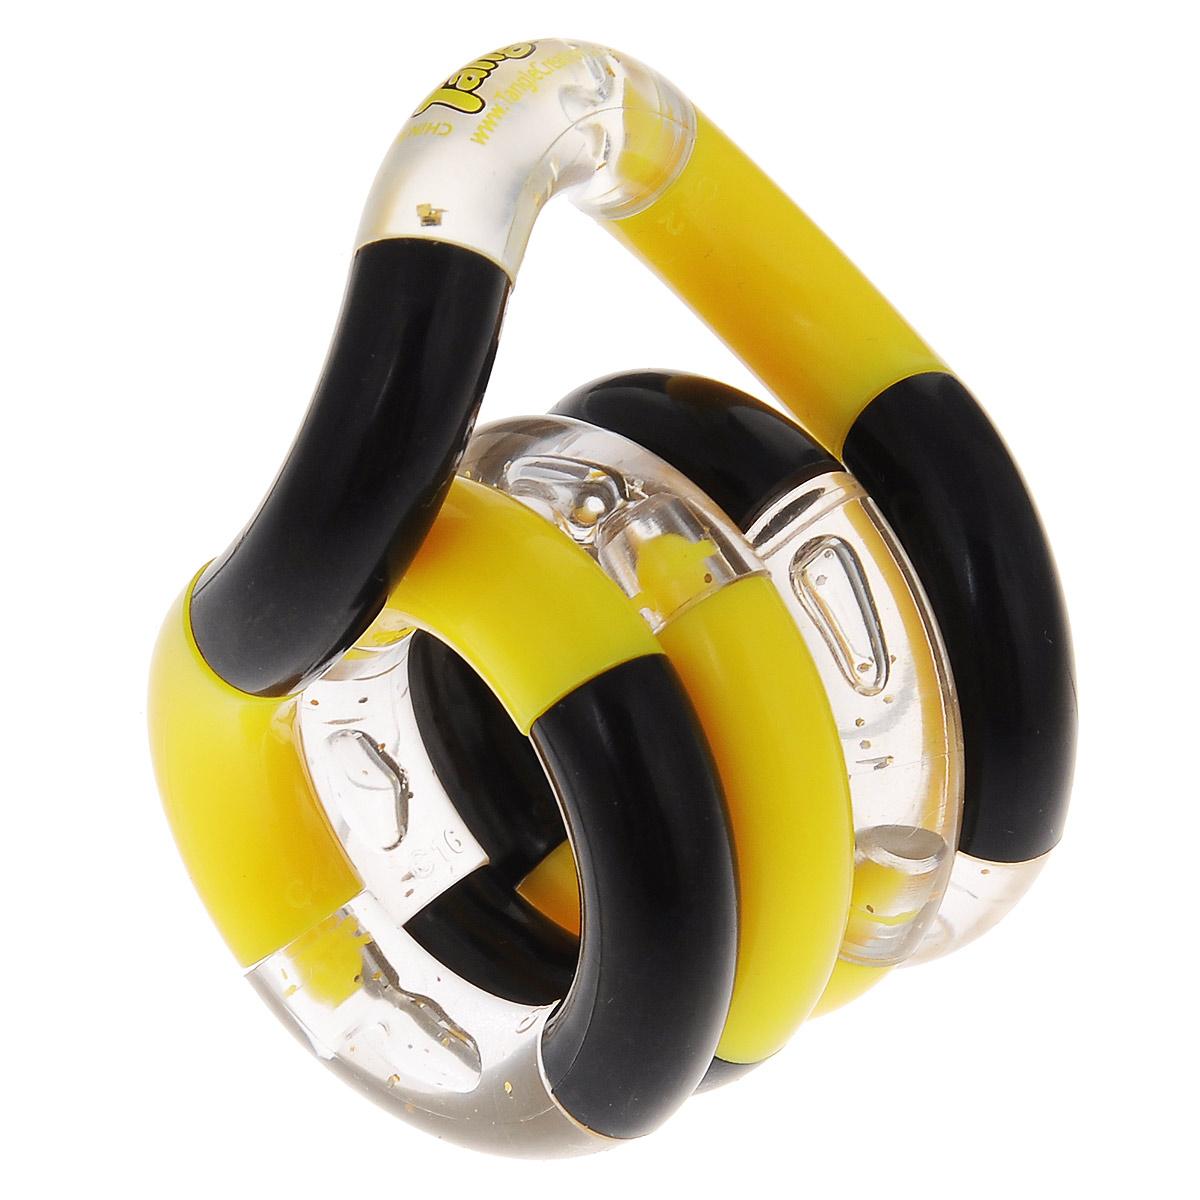 "Змейка ""Tangle. Классик"", цвет: желтый, черный"